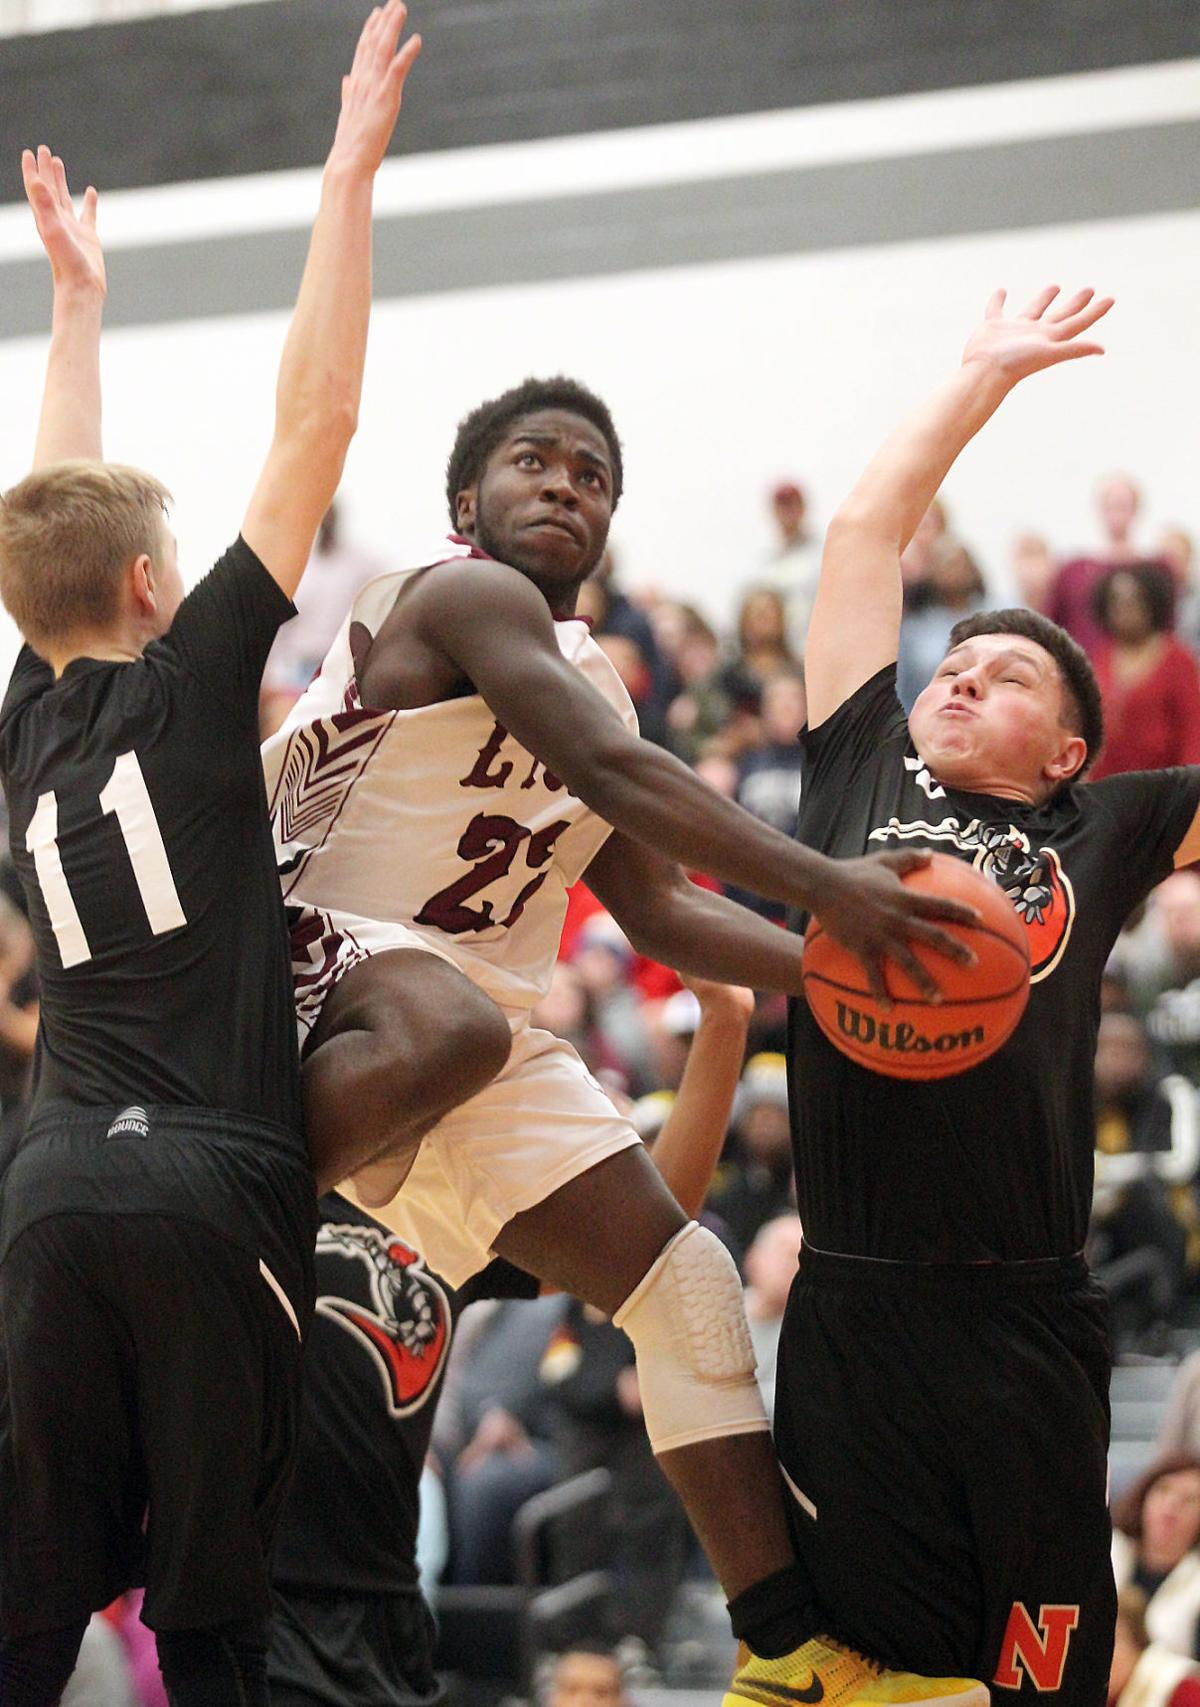 Lyons basketball